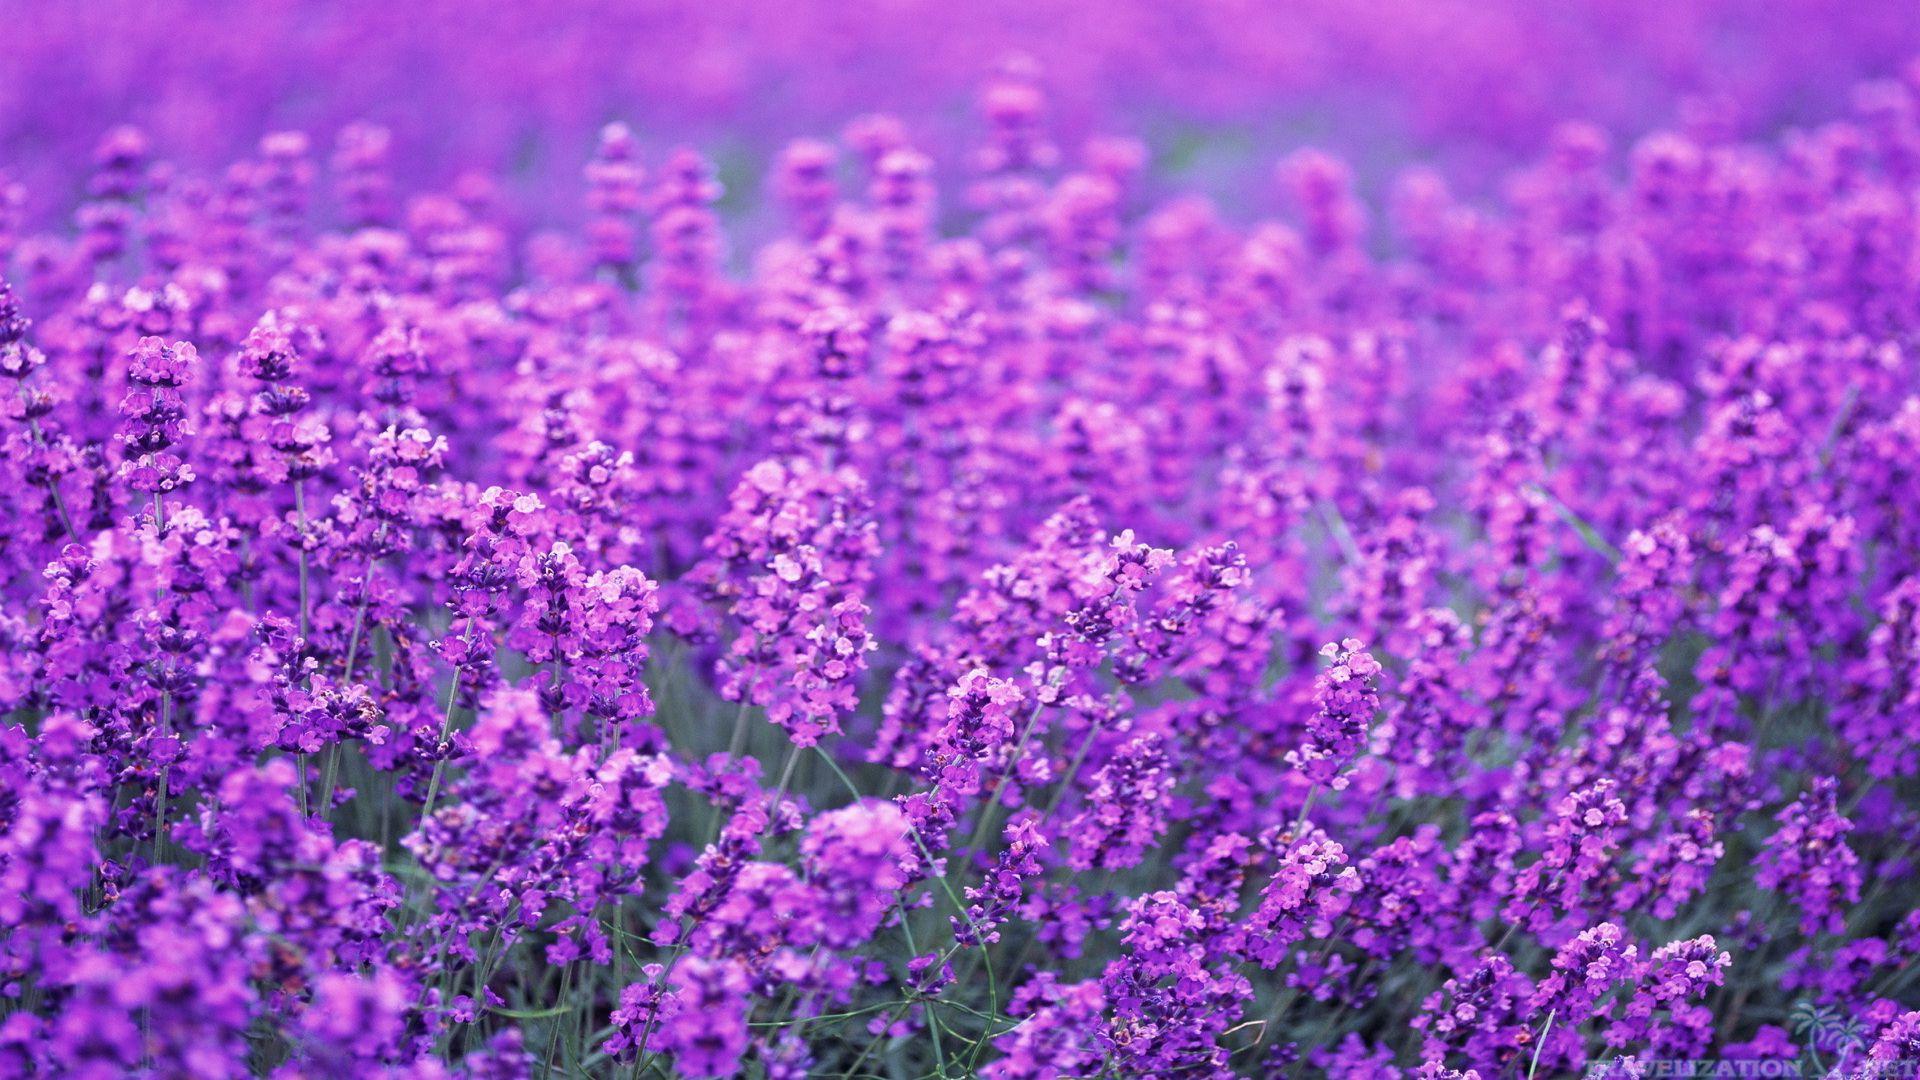 ... 2560×1920. Lavender Poppy Wallpapers